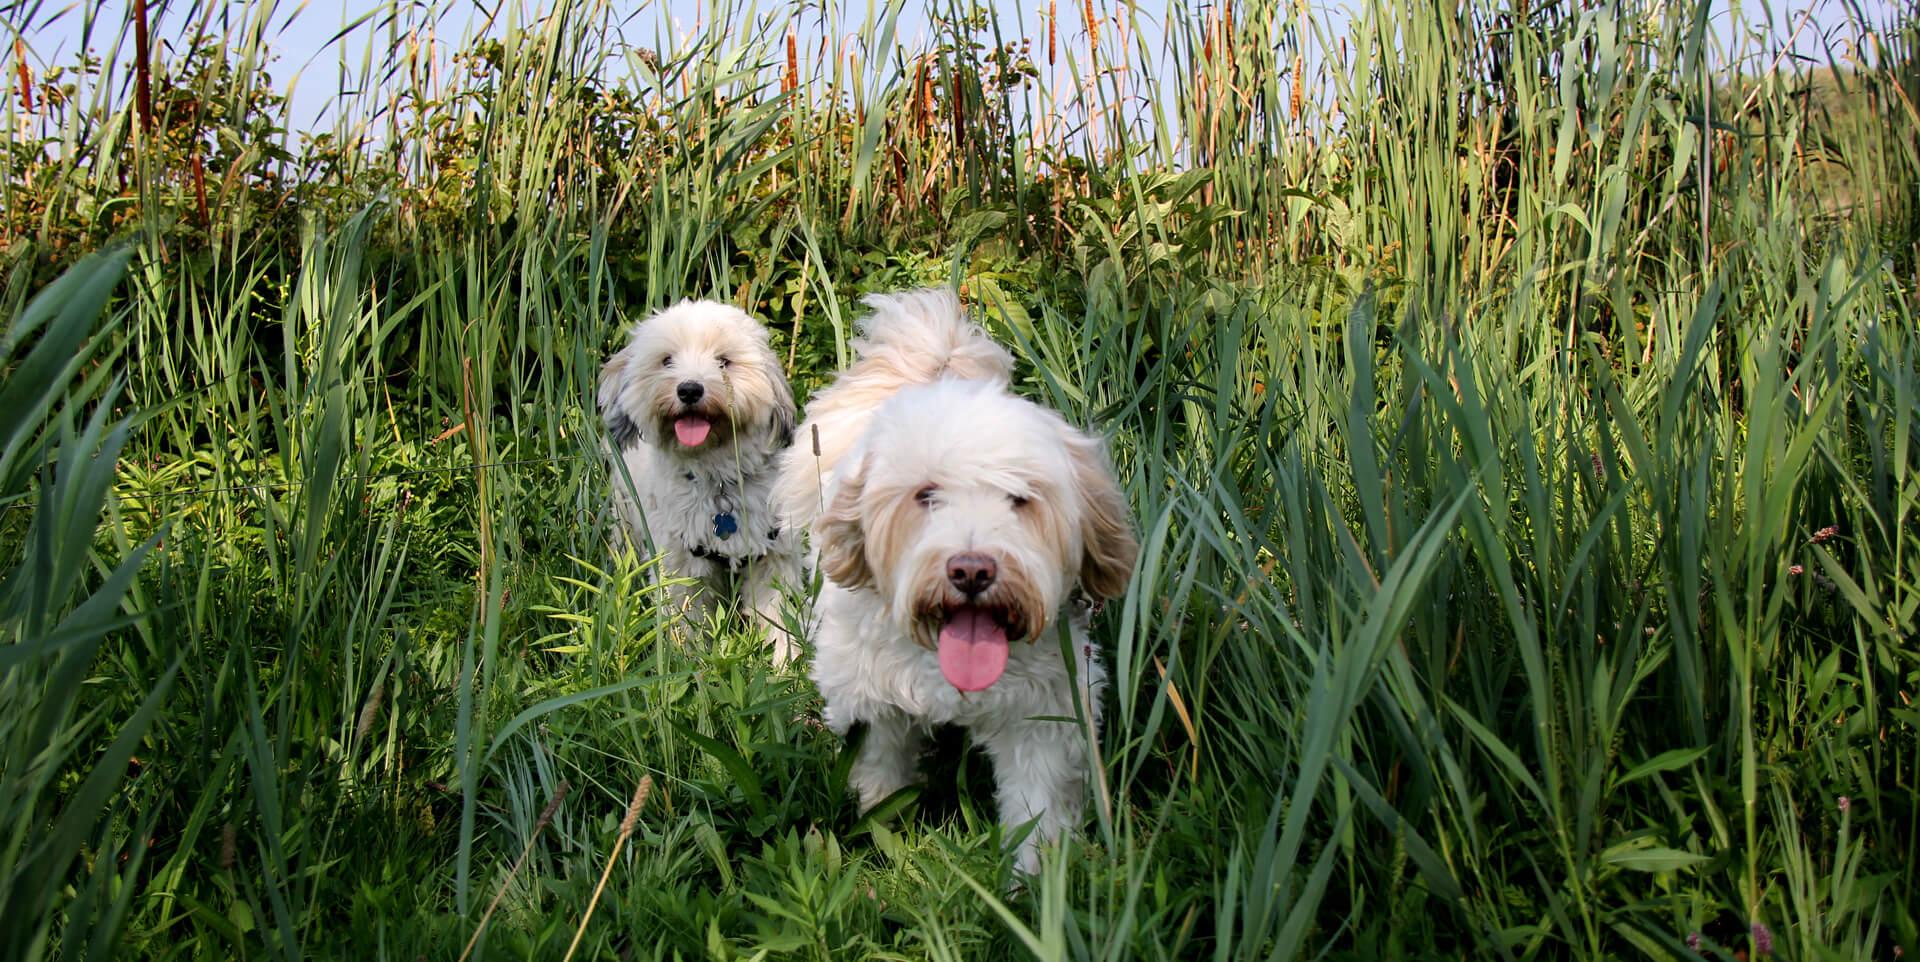 Five Marketing Tasks for the Dog Days of Summer